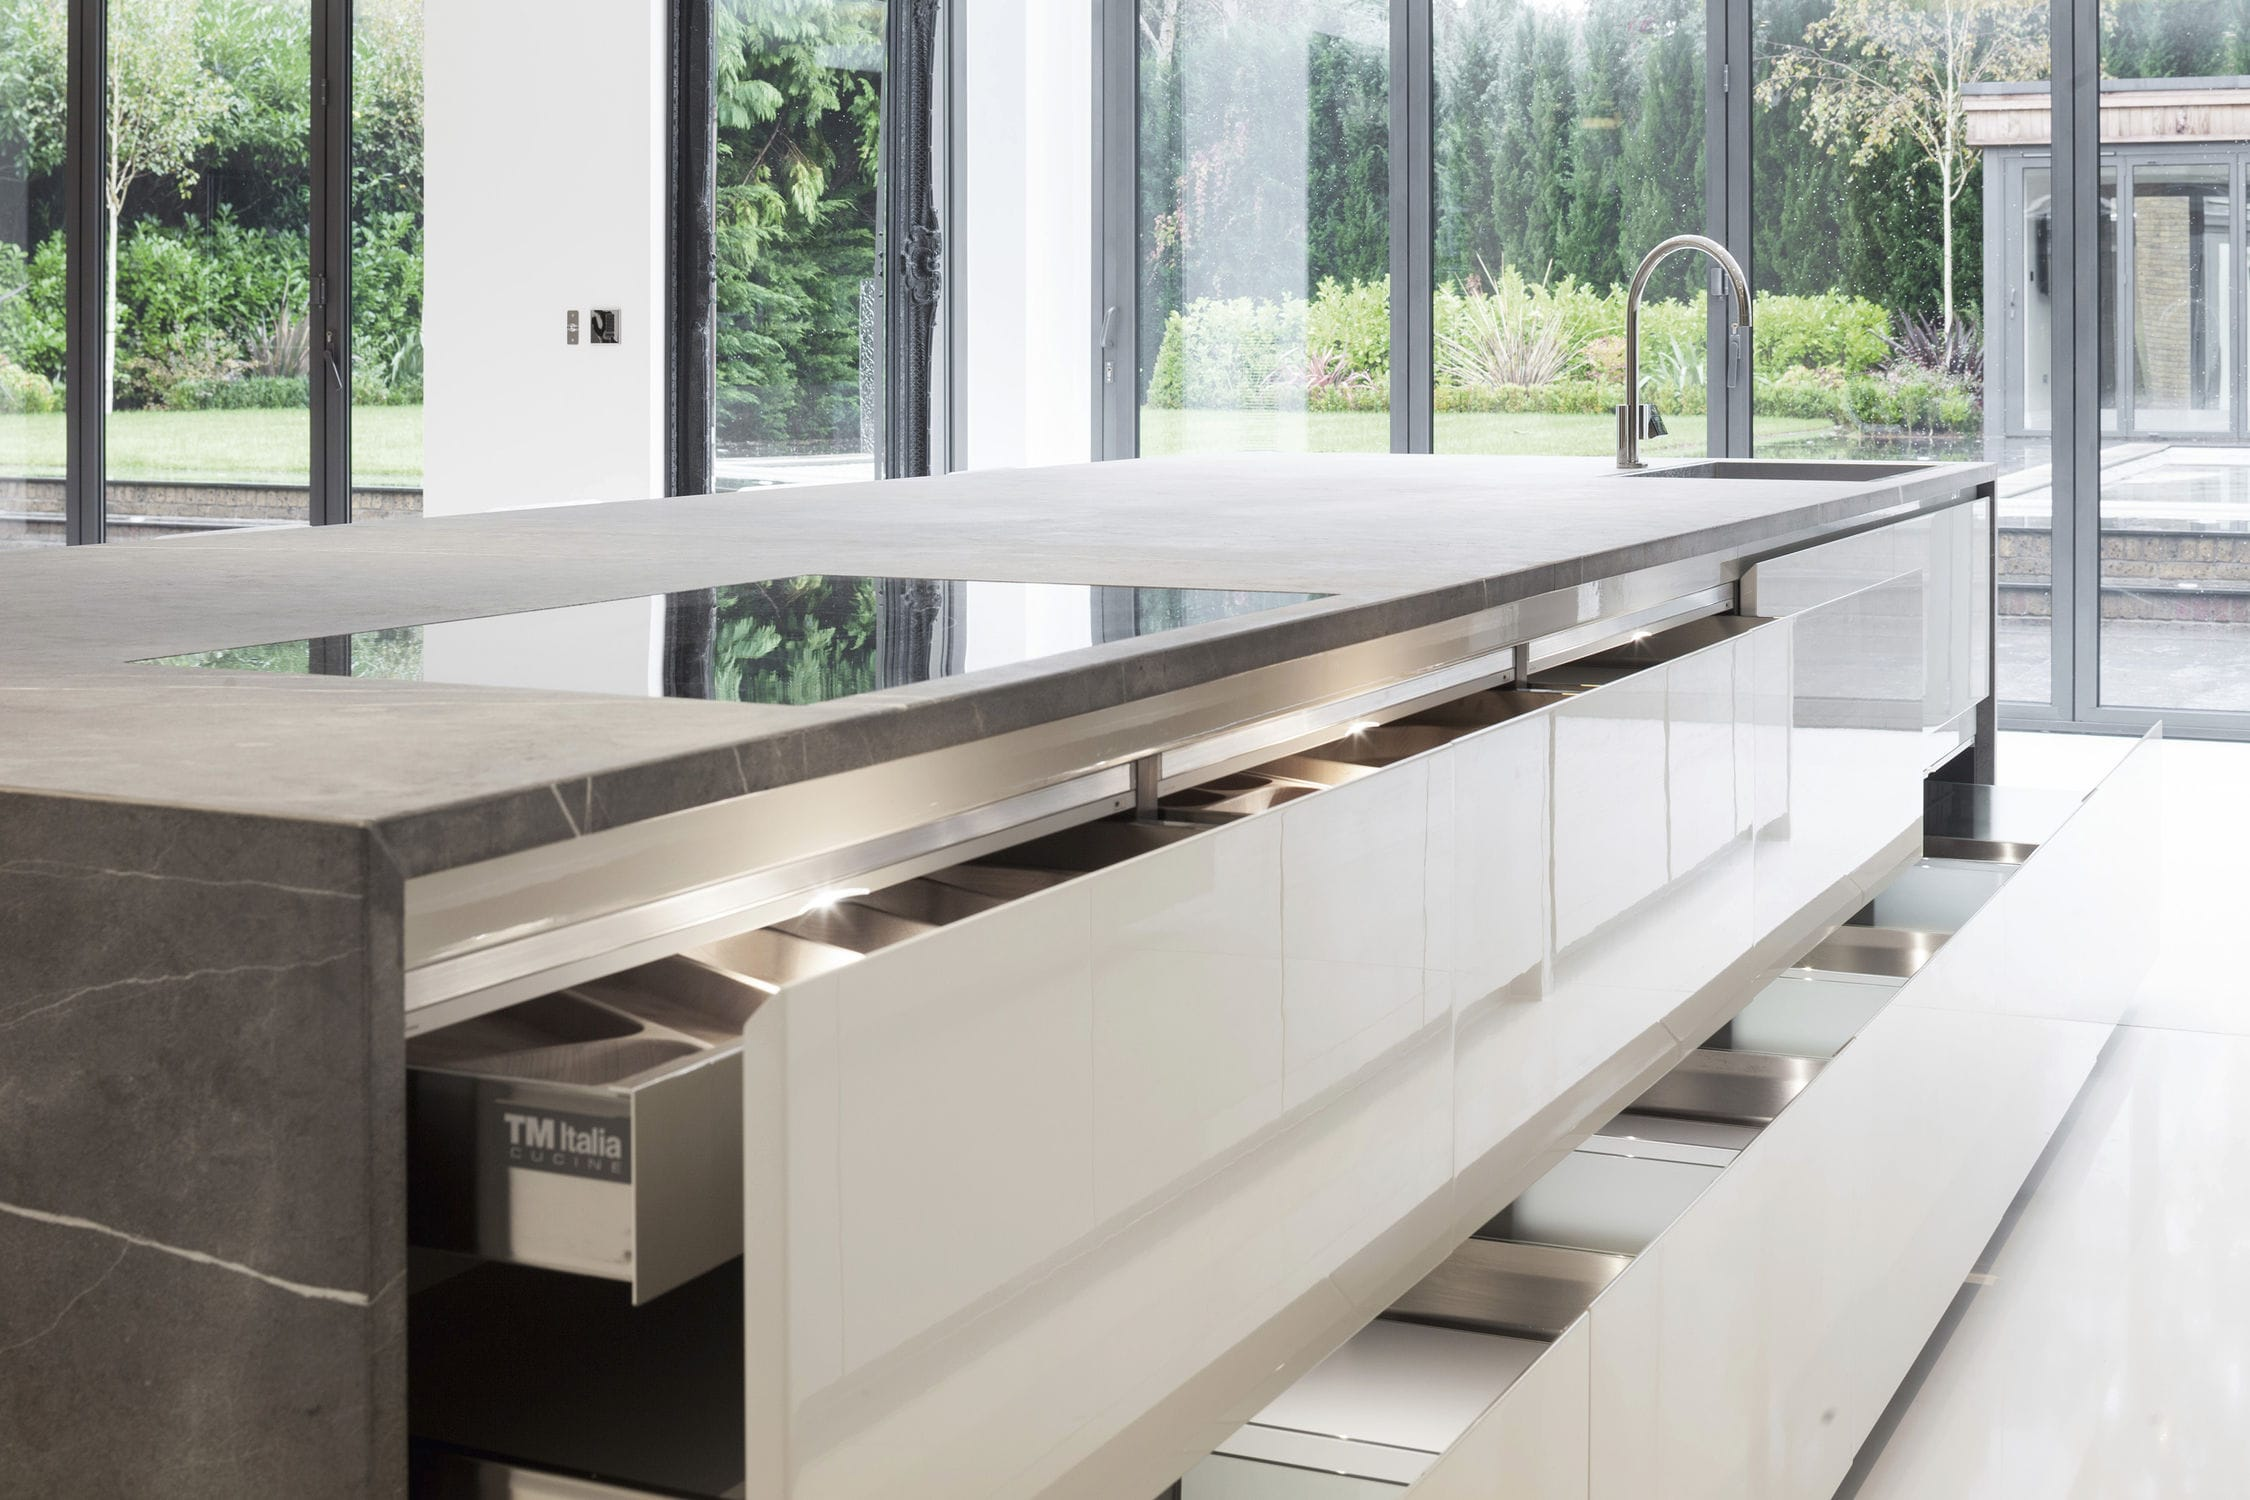 ... Moderne Küche / Stein / Kochinsel 201212#01_T45_PIETRA DI CORINTO TM  Italia ...